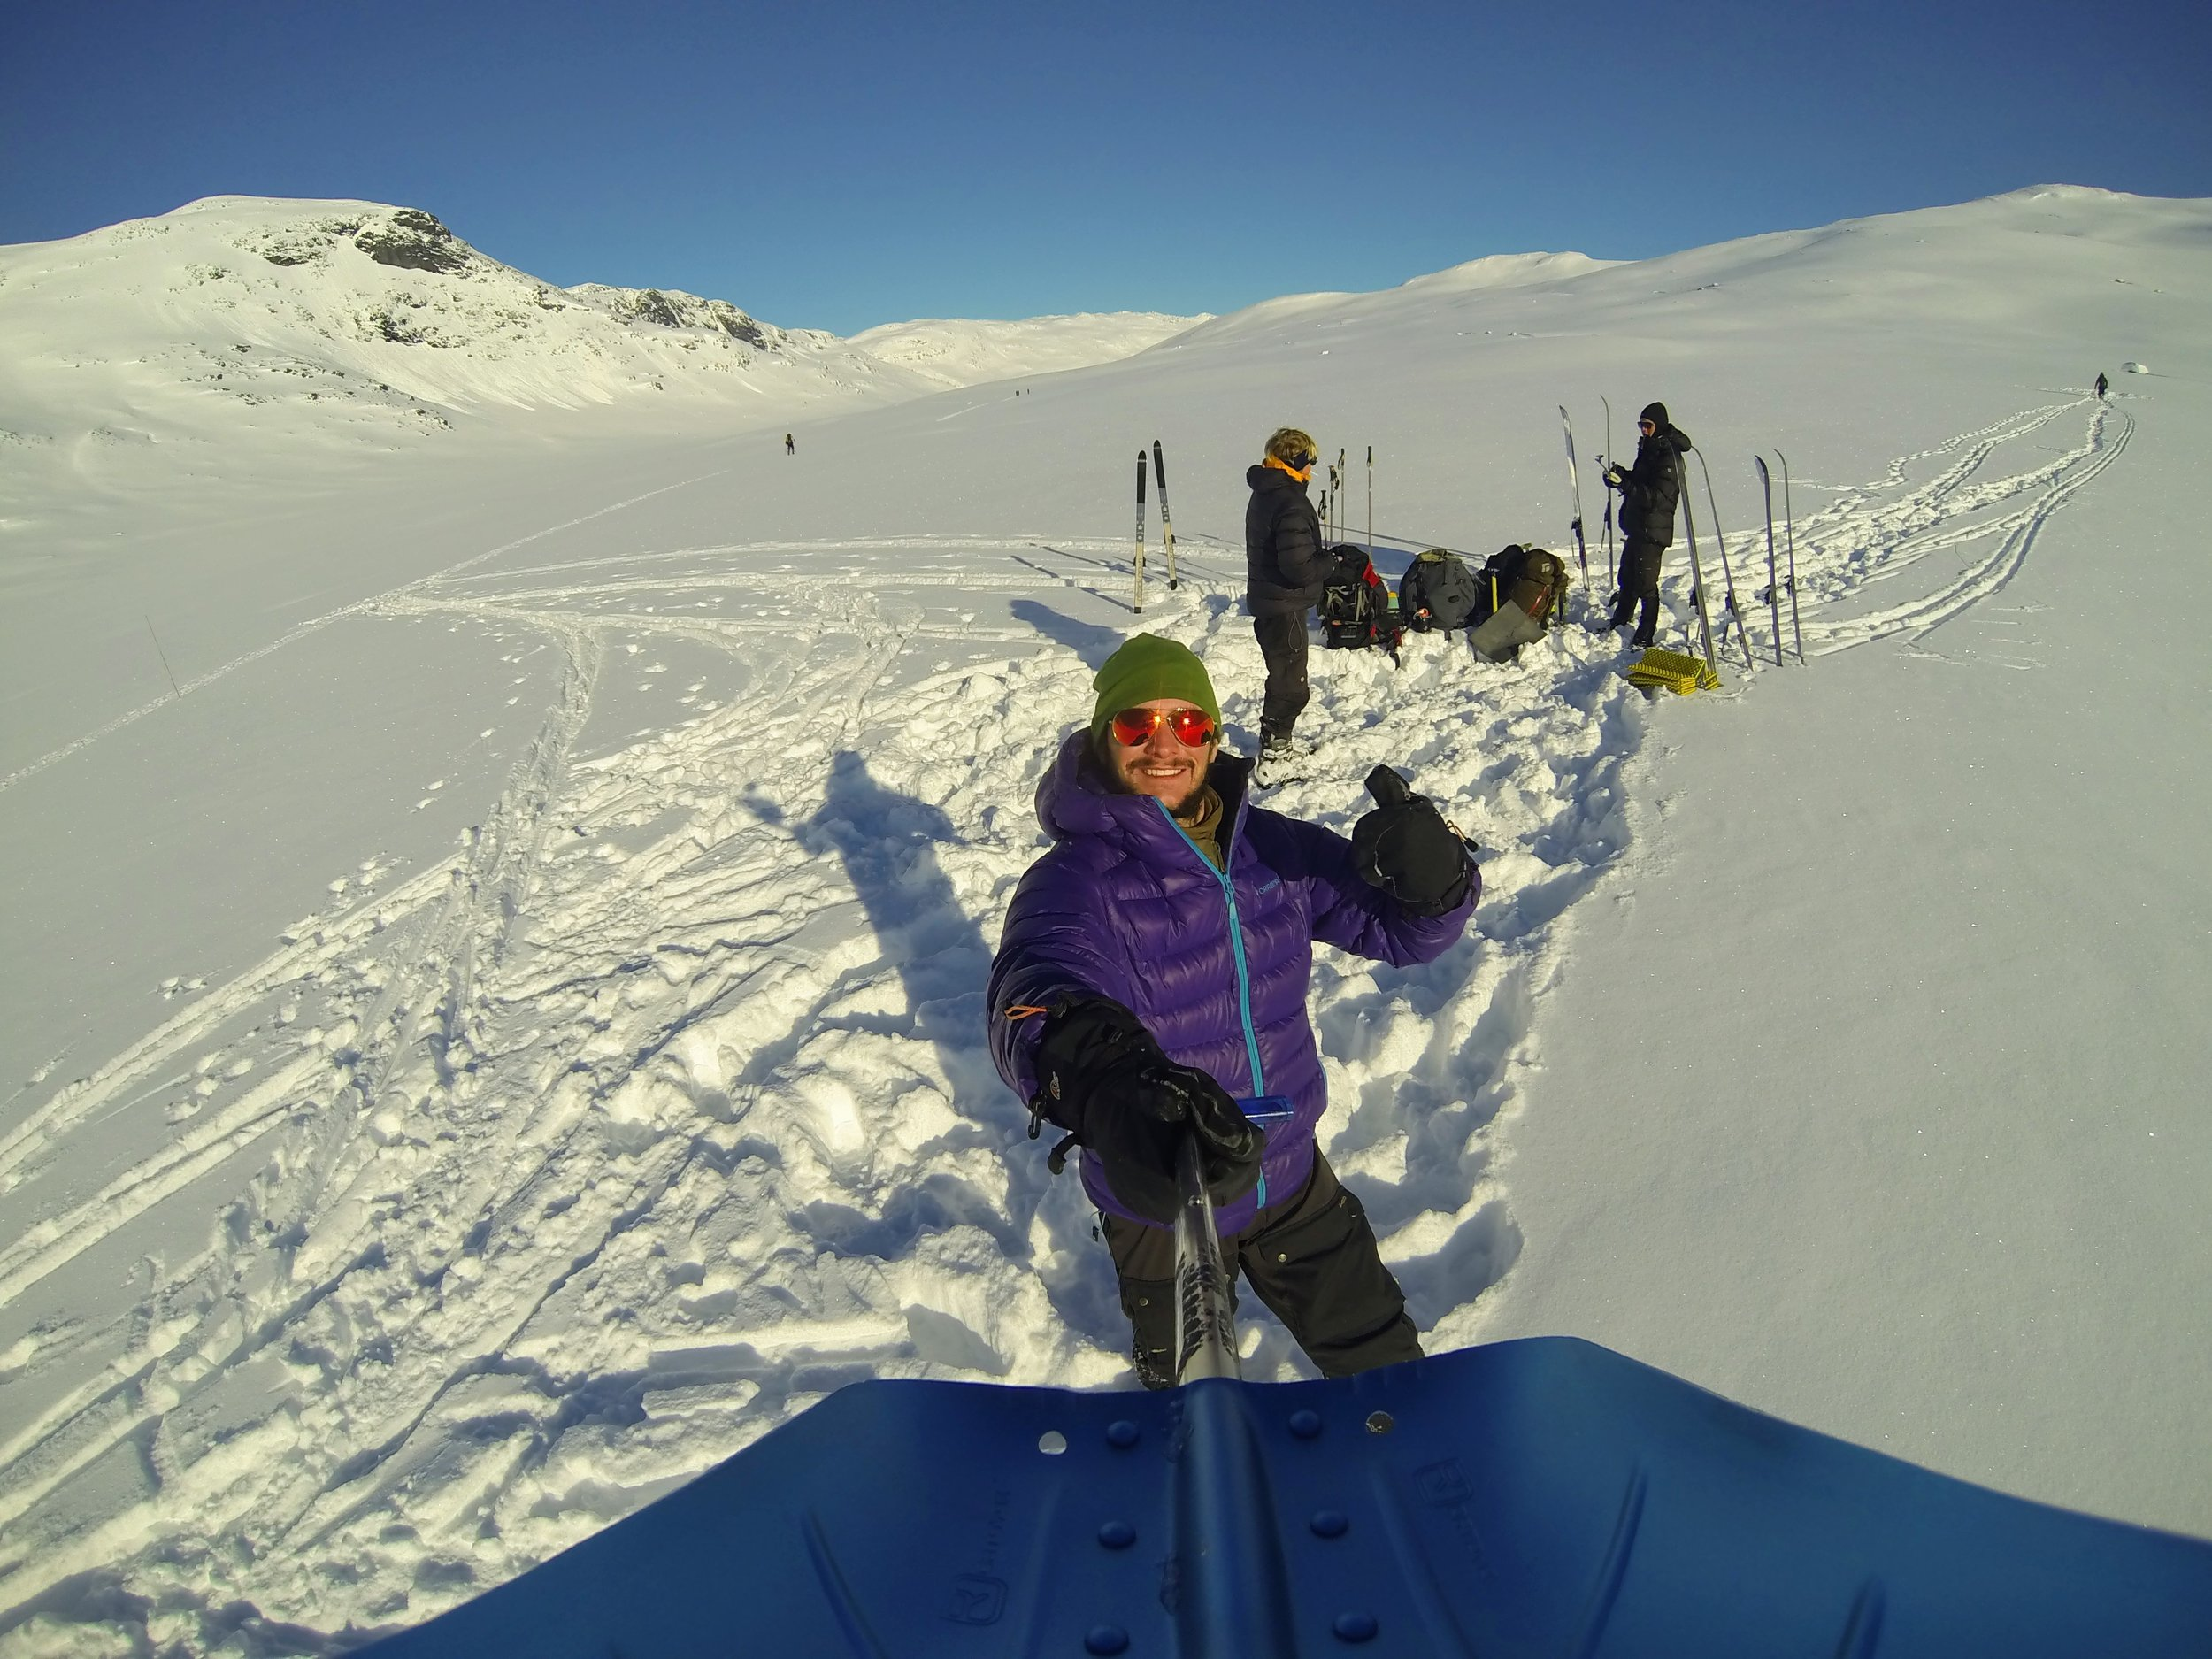 Fra min vinterfjeldstur i  Hurrungarne  i 2016